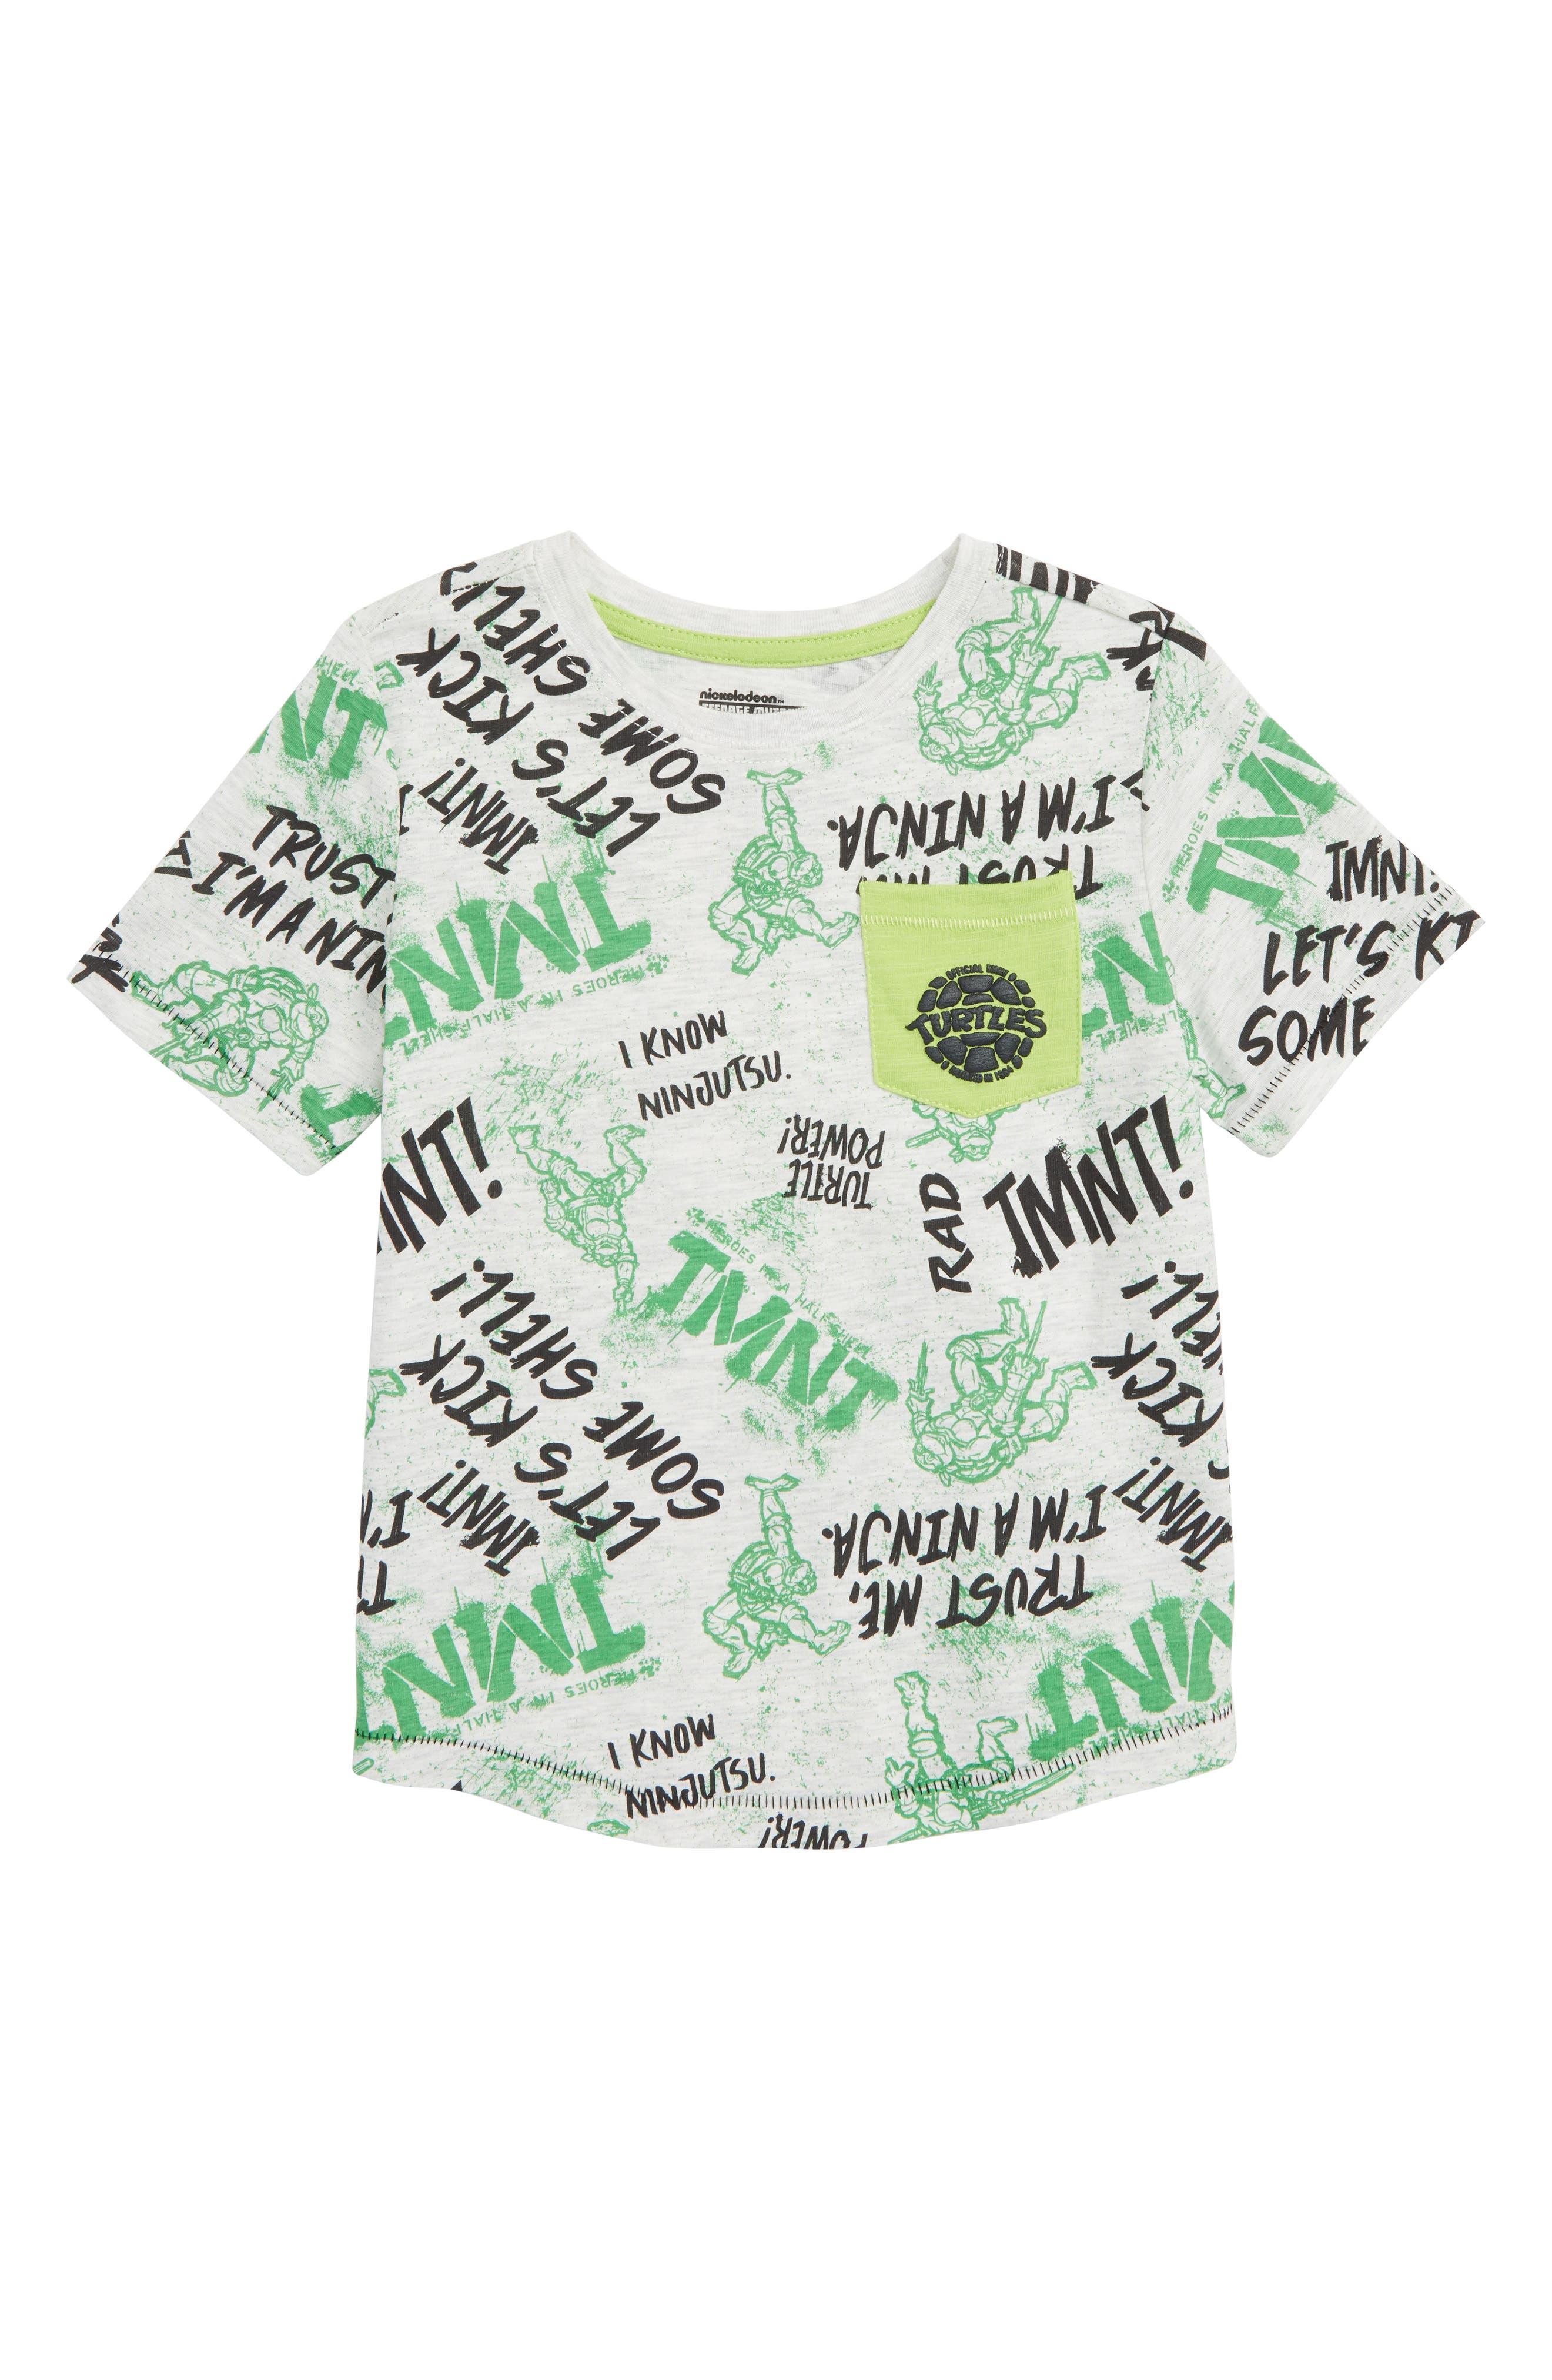 Teenage Mutant Ninja Turtles T-Shirt,                             Main thumbnail 1, color,                             300